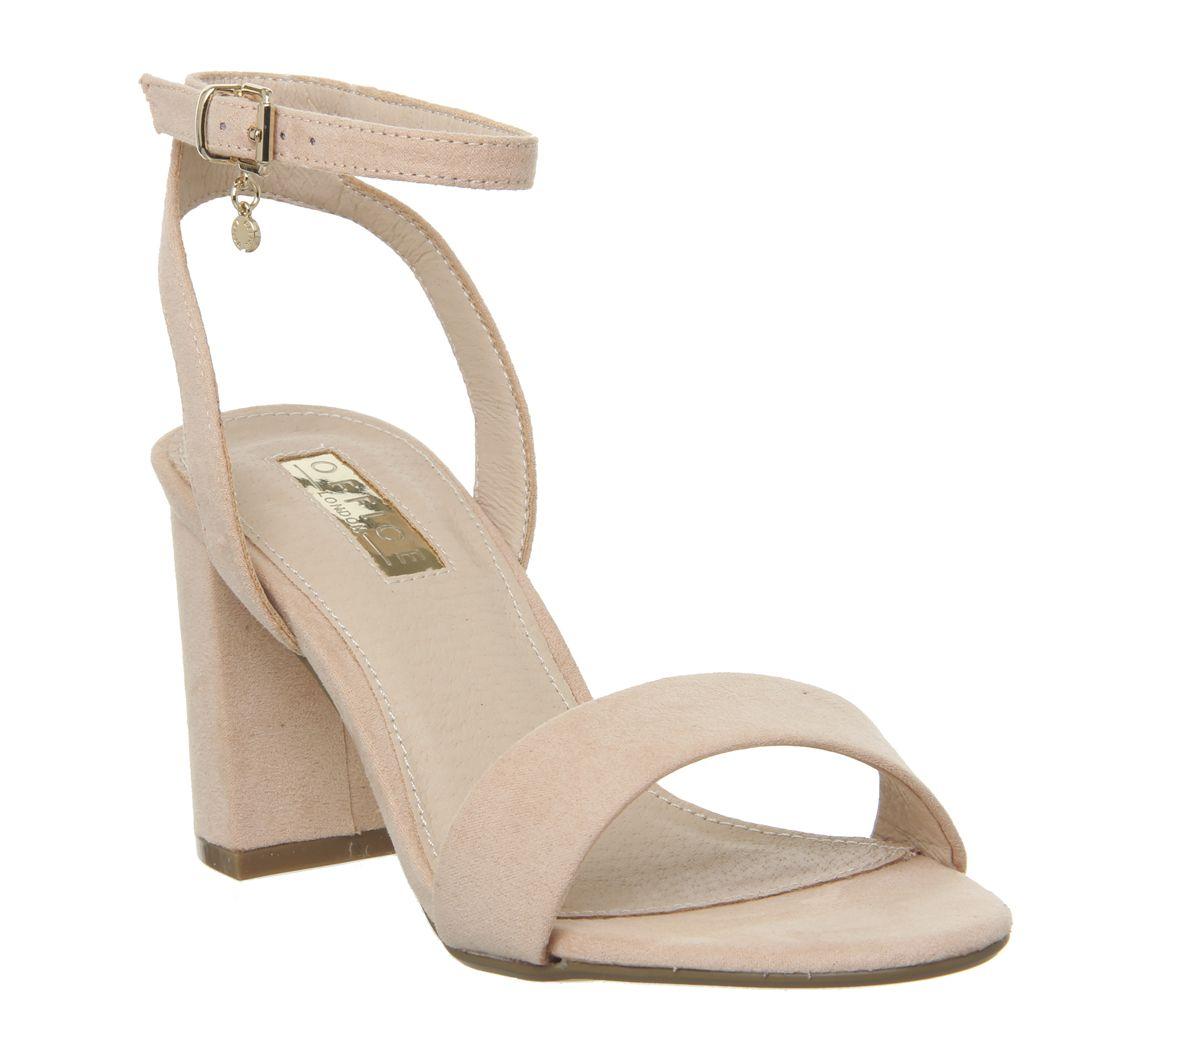 8a93093f4 Office Marigold Strappy Heels Nude - Mid Heels